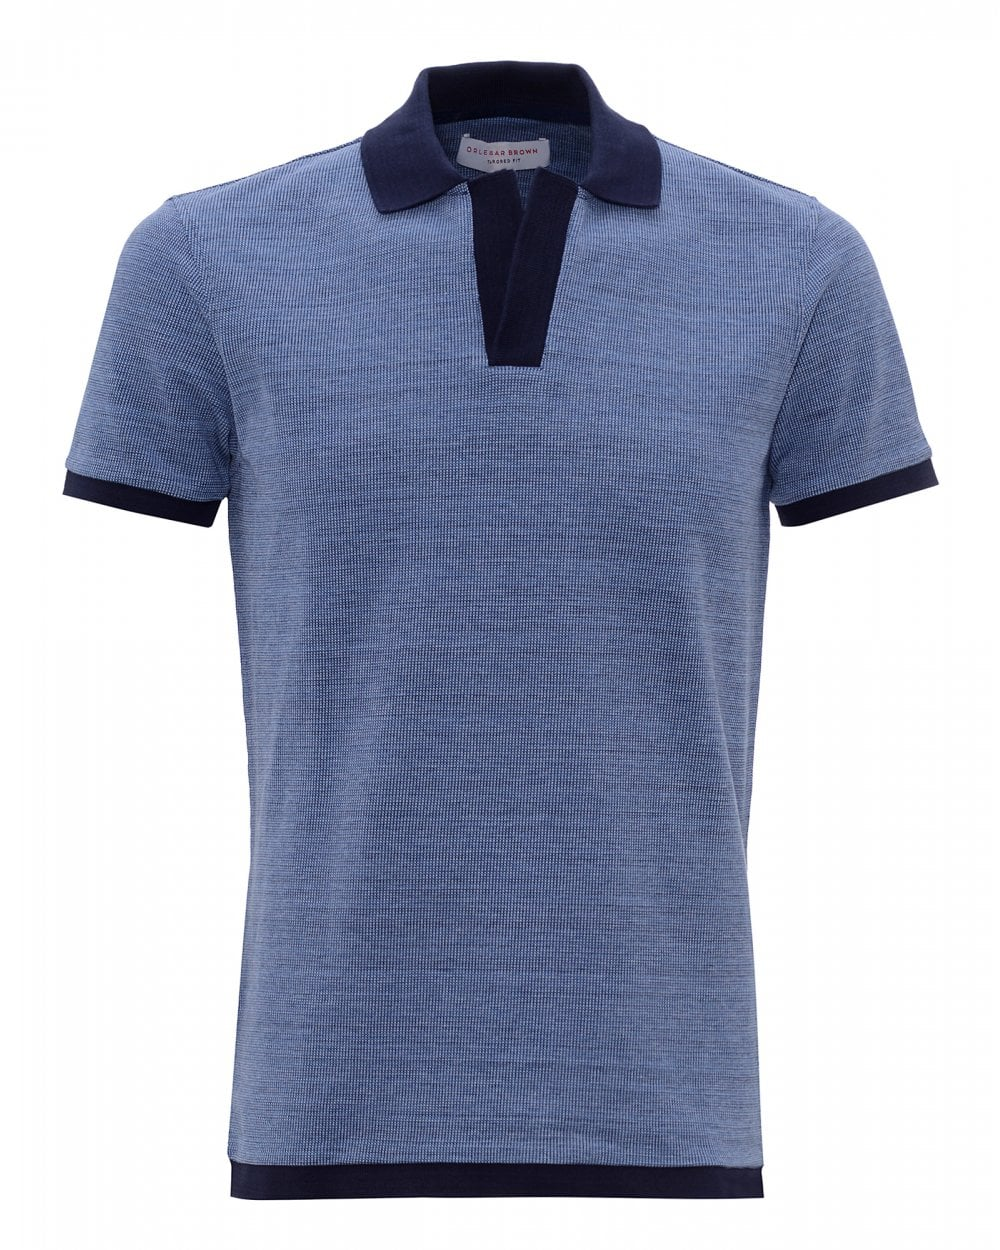 d774e2b0 Orlebar Brown Mens Felix Pewter Navy Pique Resort Polo Shirt